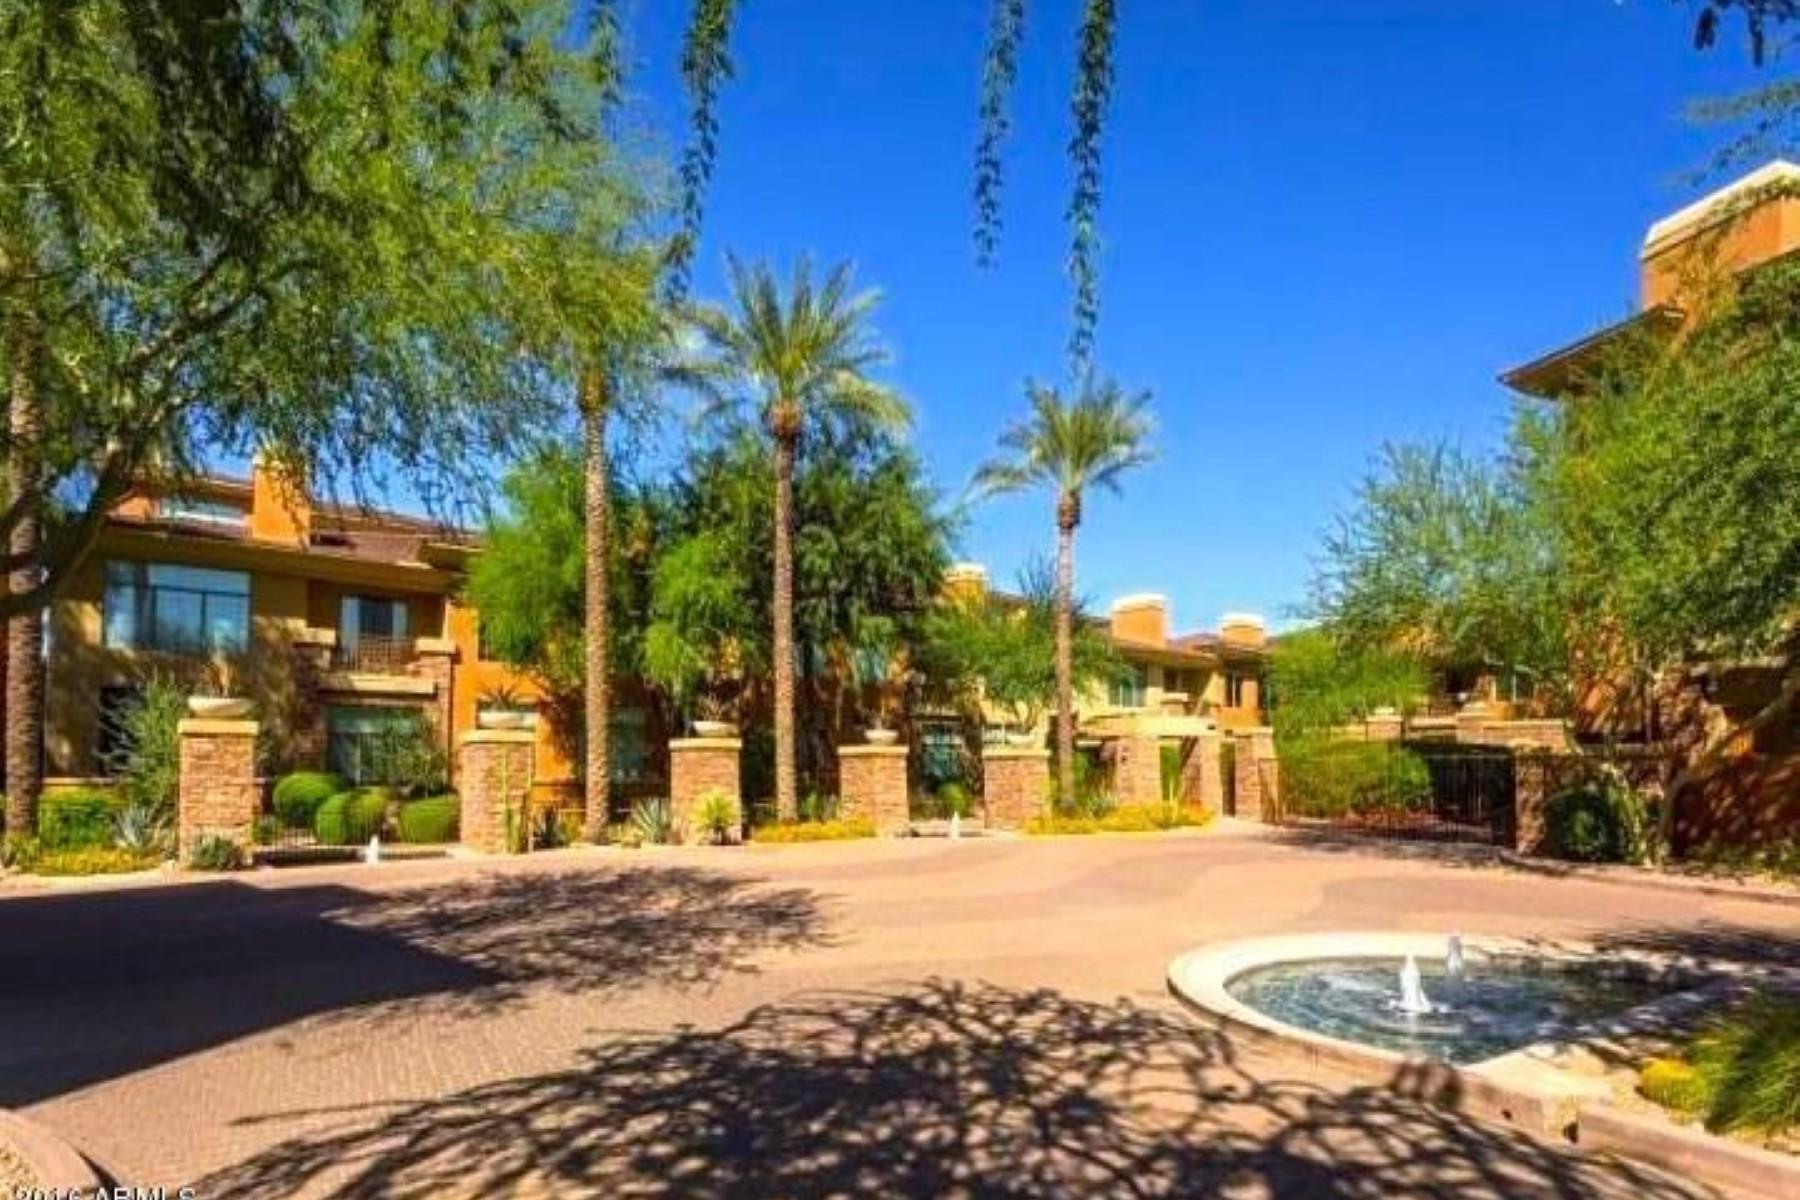 Konak için Satış at Interior floorplan is offered for sale in Astragal Luxury Villas 14450 N Thompson Peak PKWY 214 Scottsdale, Arizona, 85260 Amerika Birleşik Devletleri